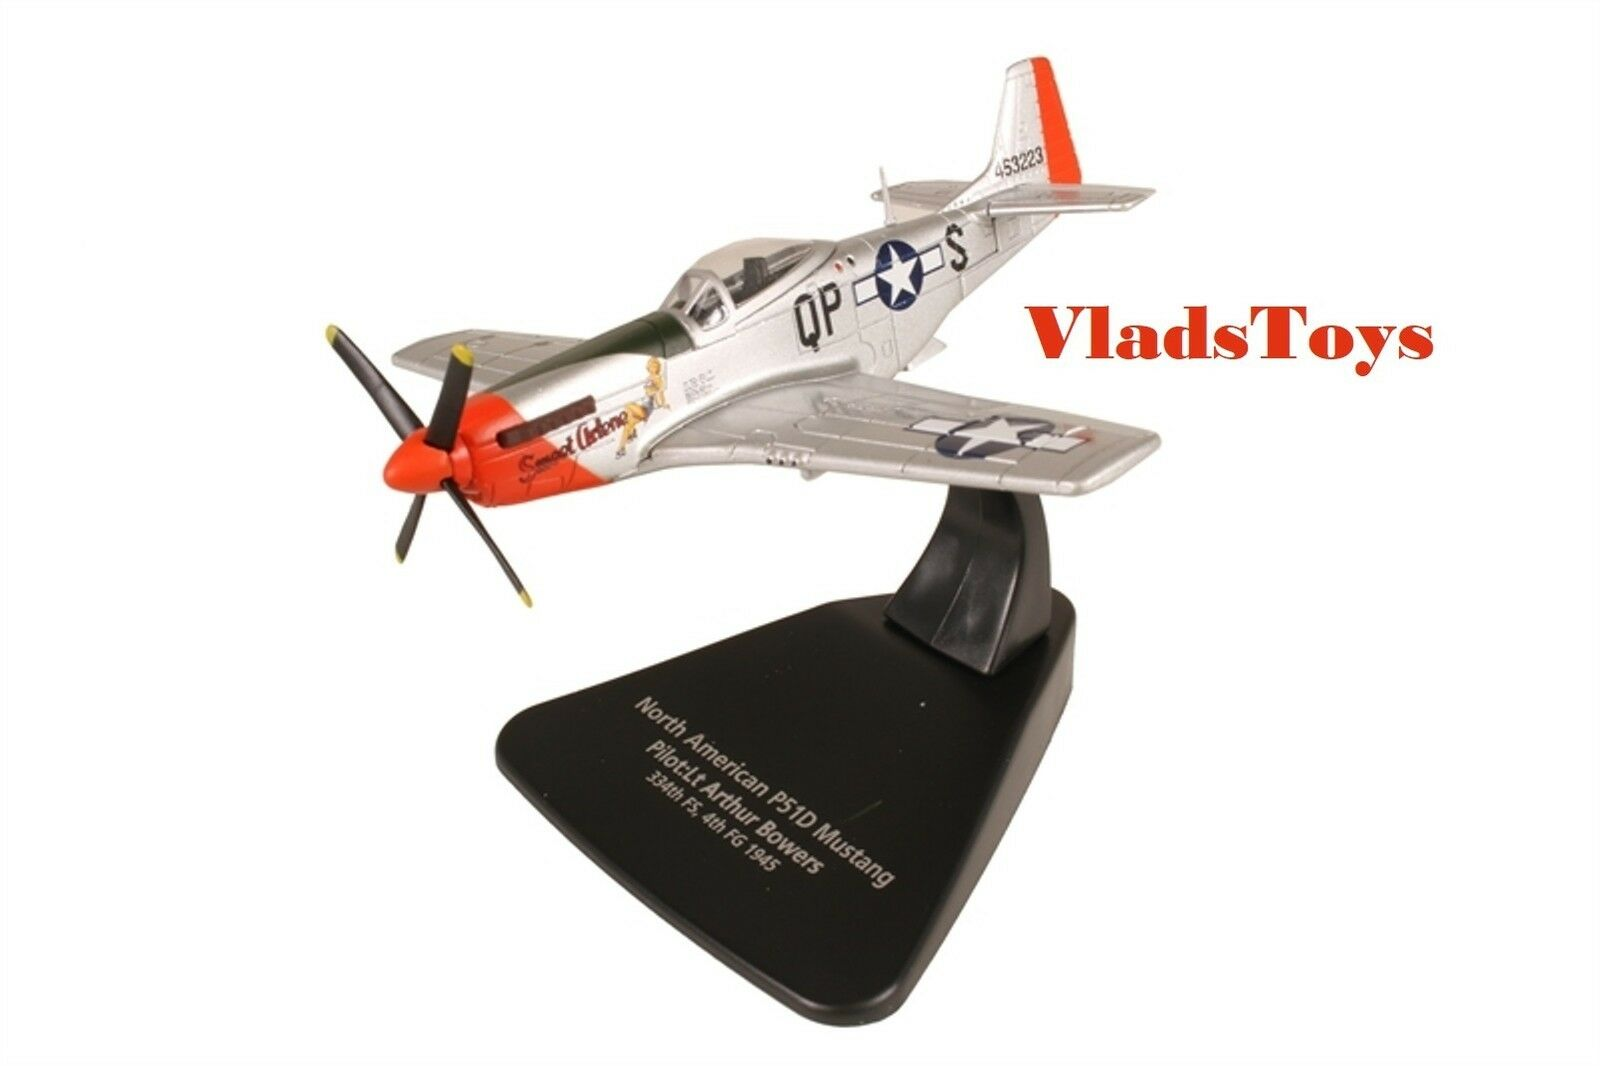 Oxford 1 72 P-51D Mustang USAAF 4th FG 334th FS Sweet Arlene Arthur Bowers AC079